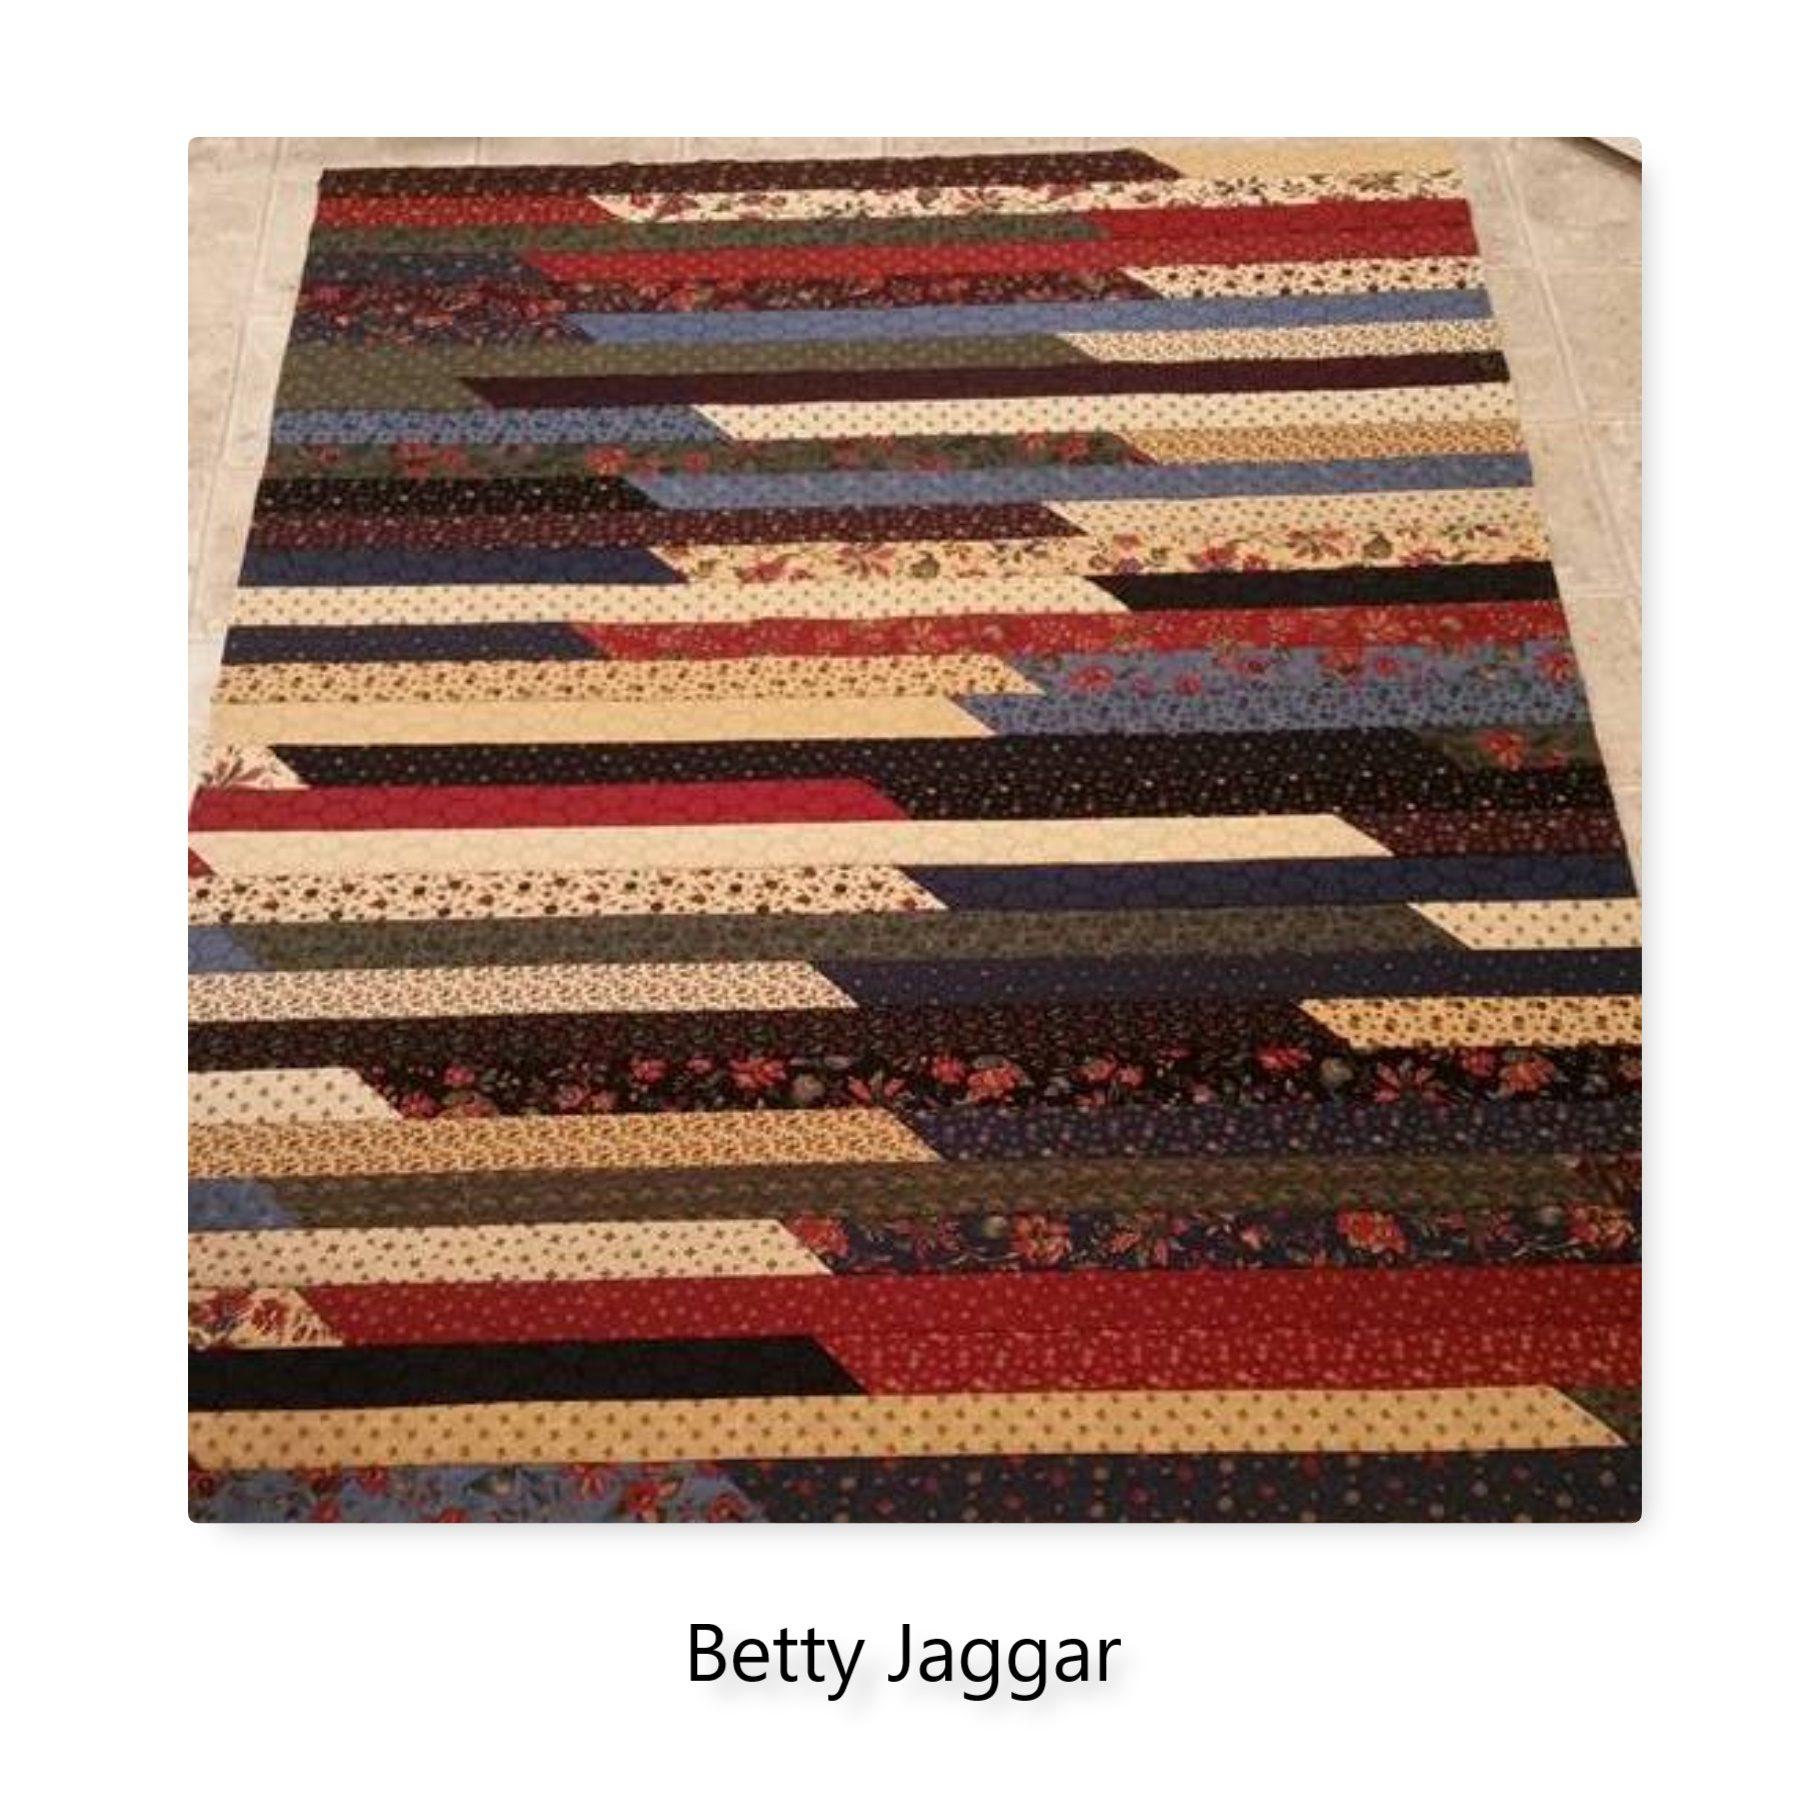 5_betty-jaggar-1-cms-2